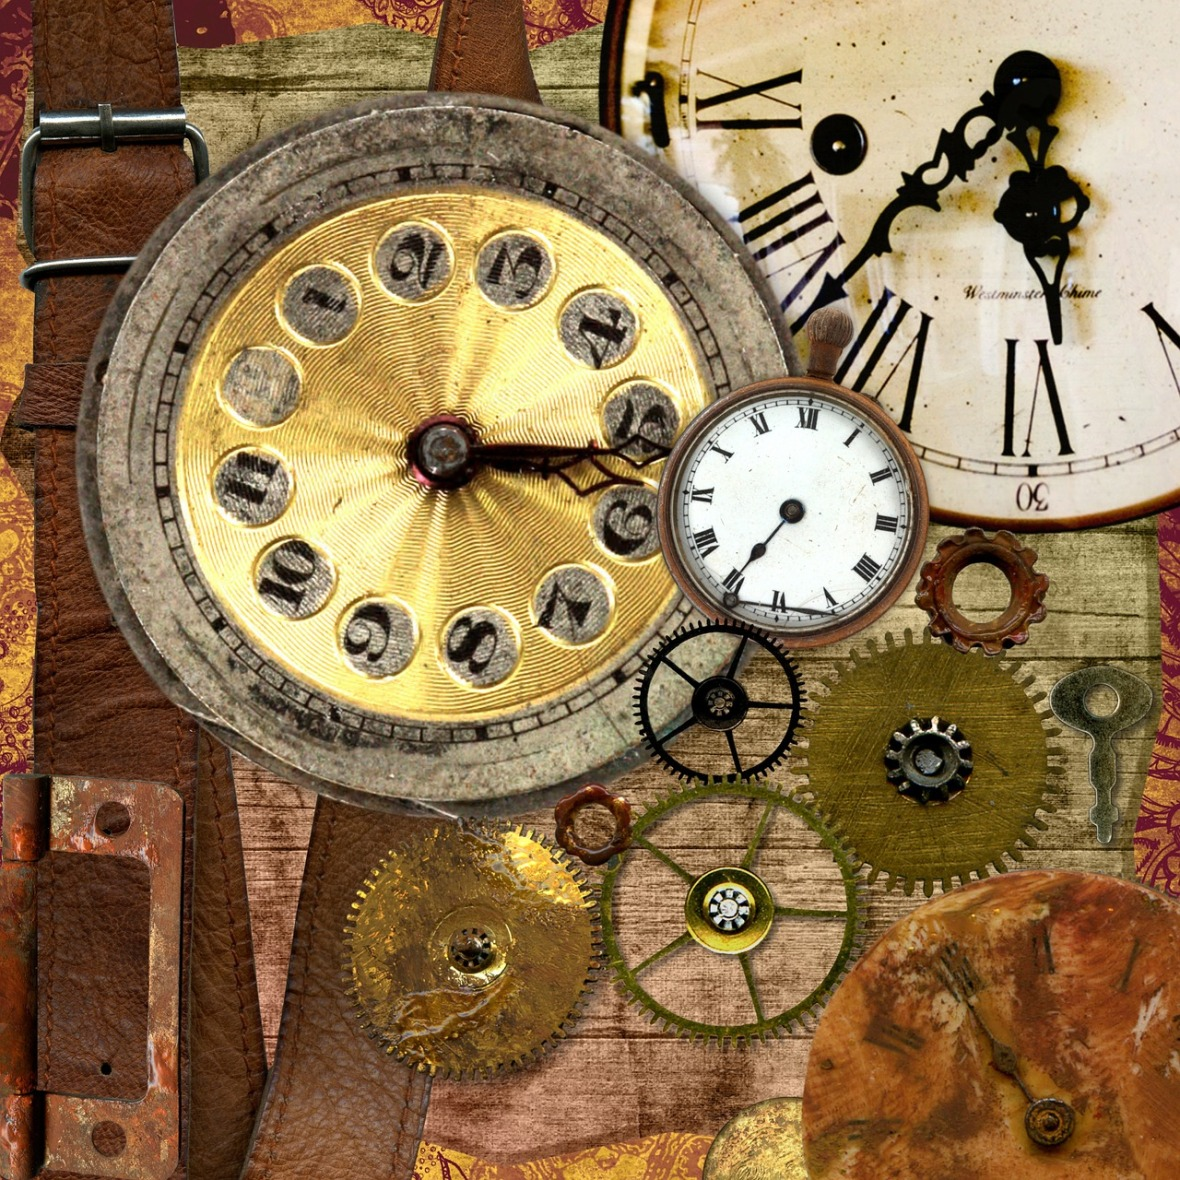 clocks-1424691_1280